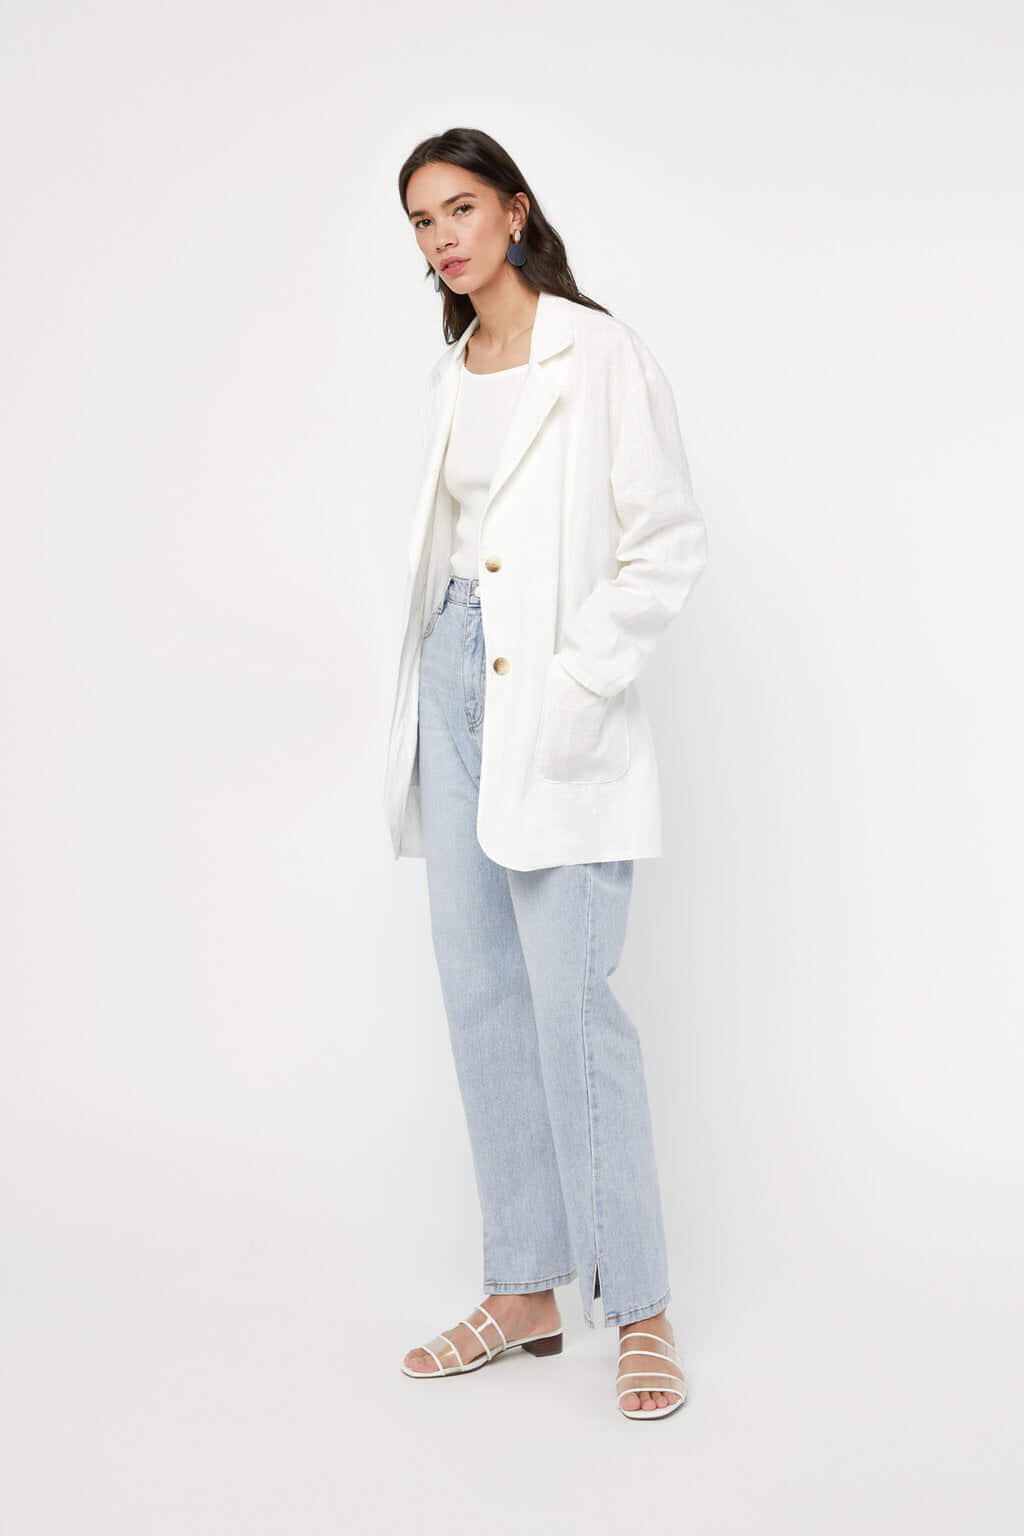 Jacket K019 Cream 4